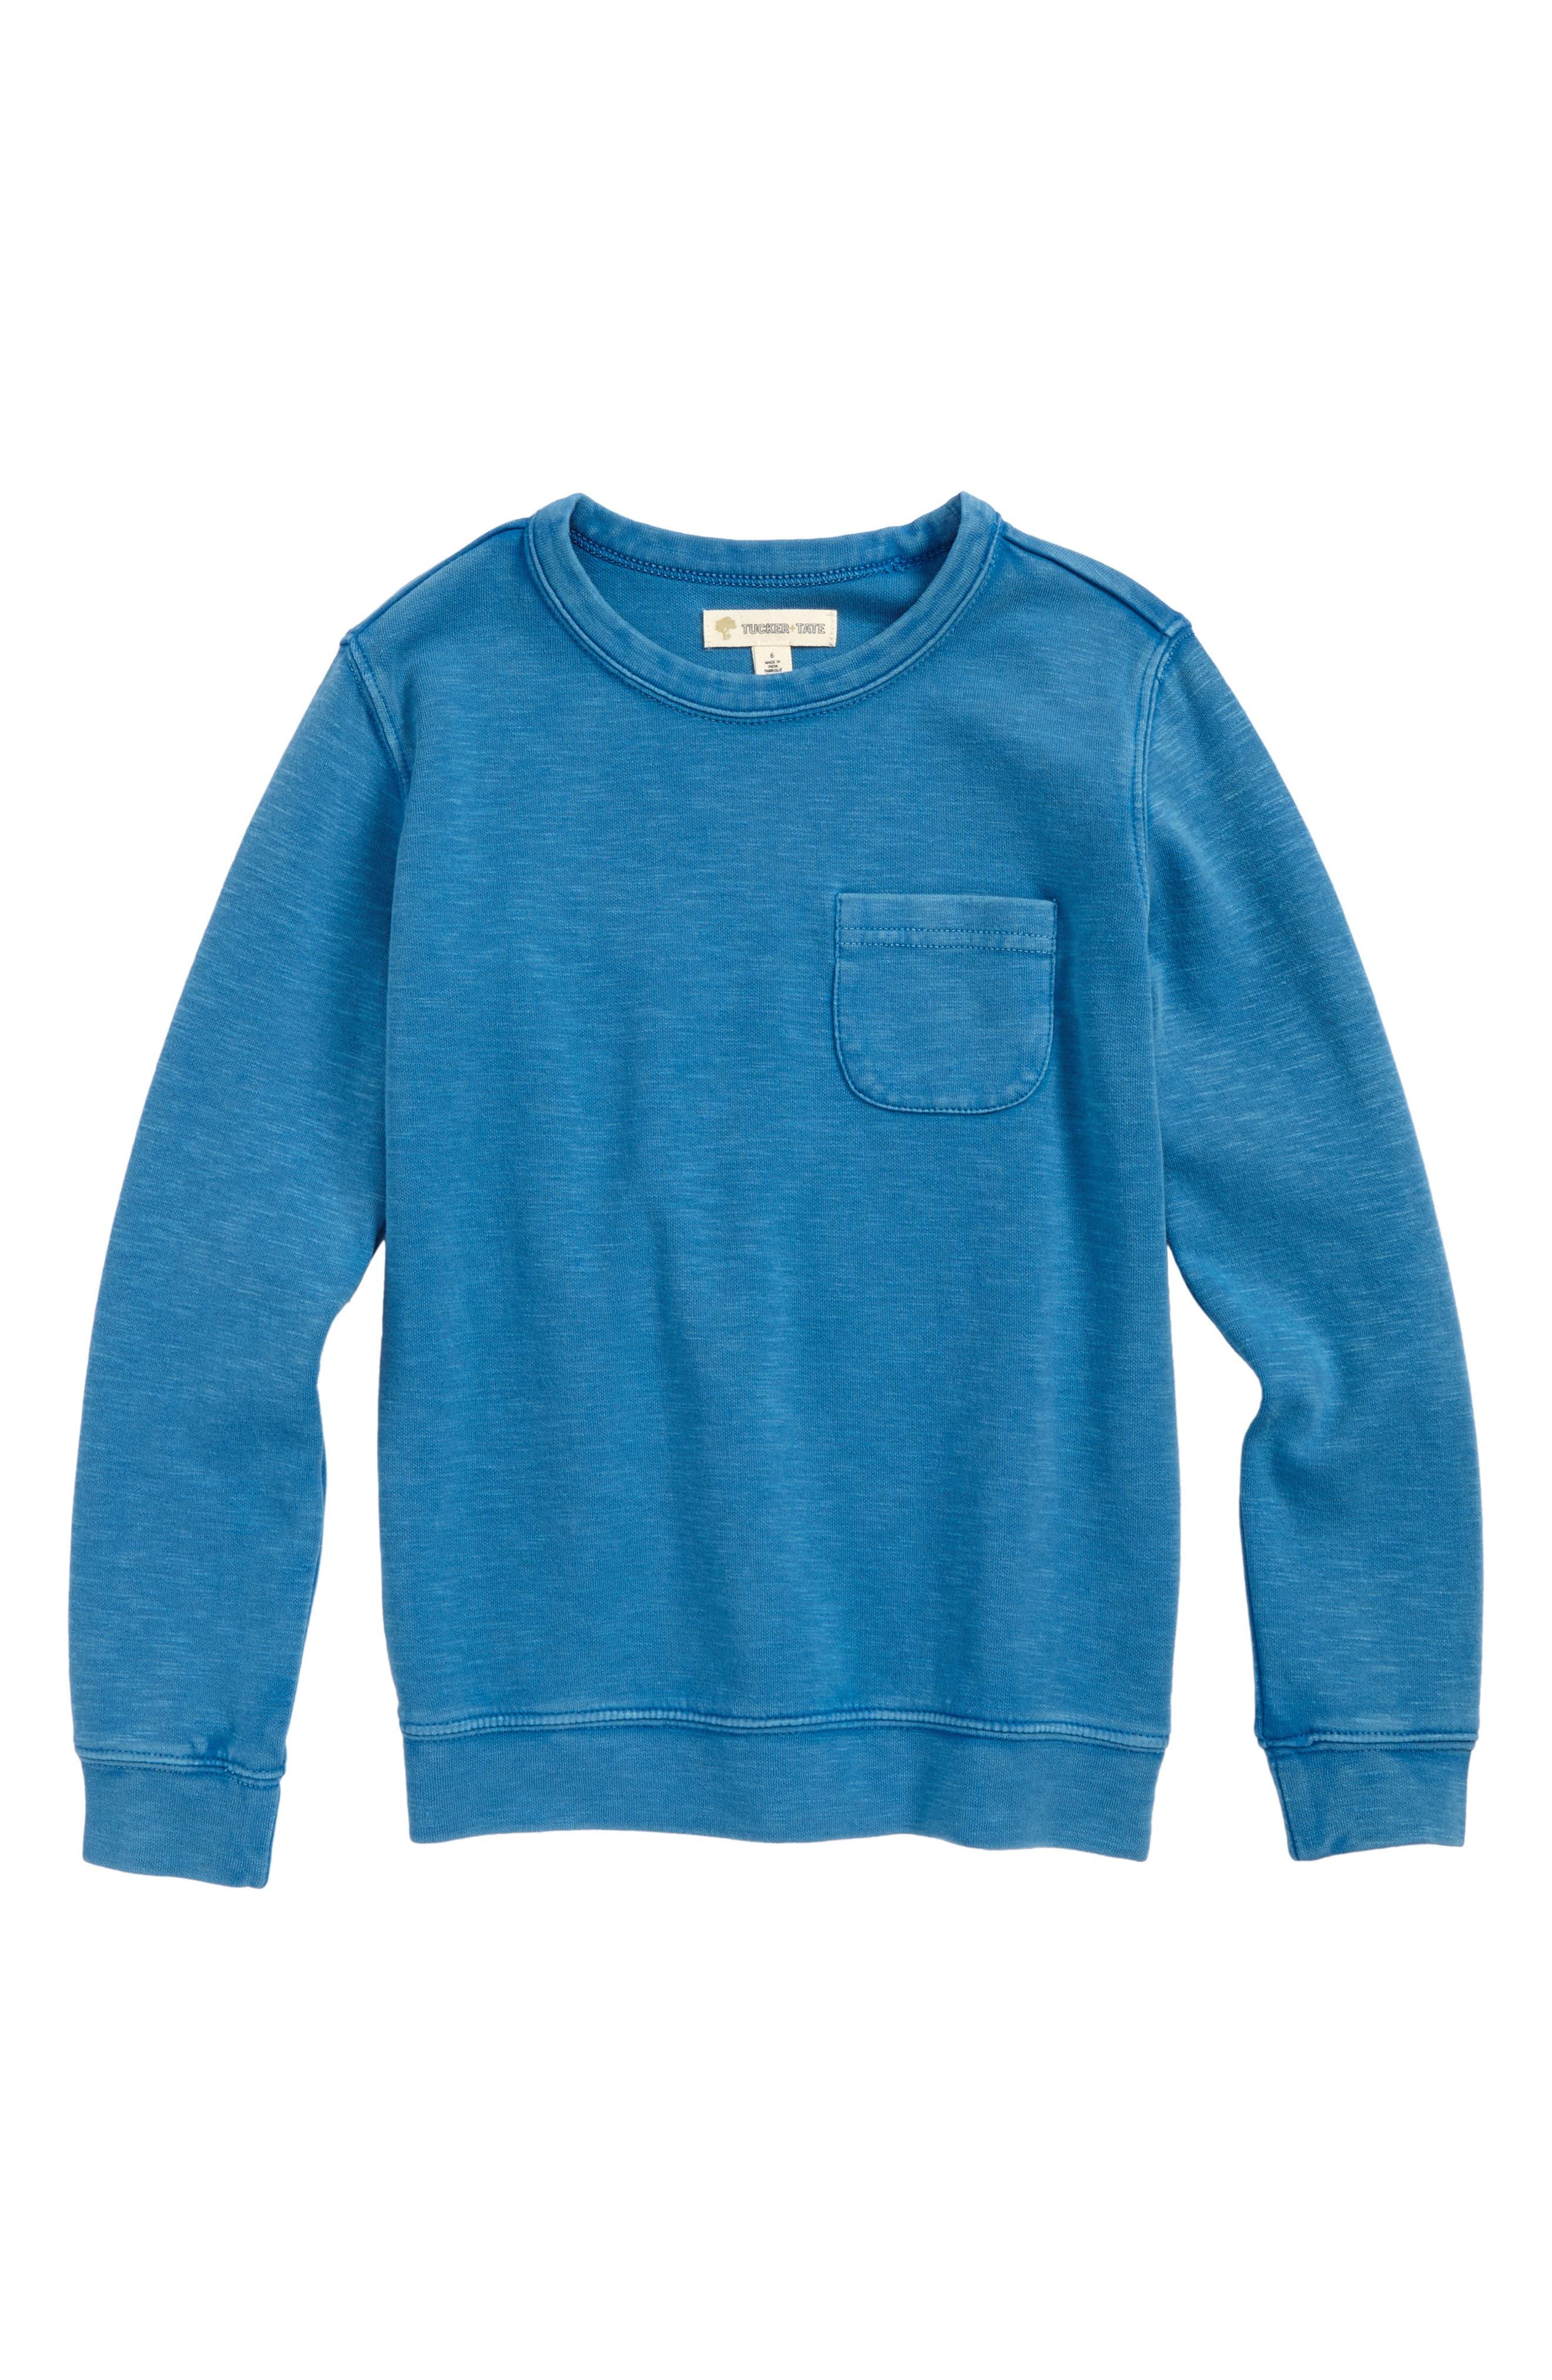 Interlock T-Shirt,                         Main,                         color, Blue Cendre